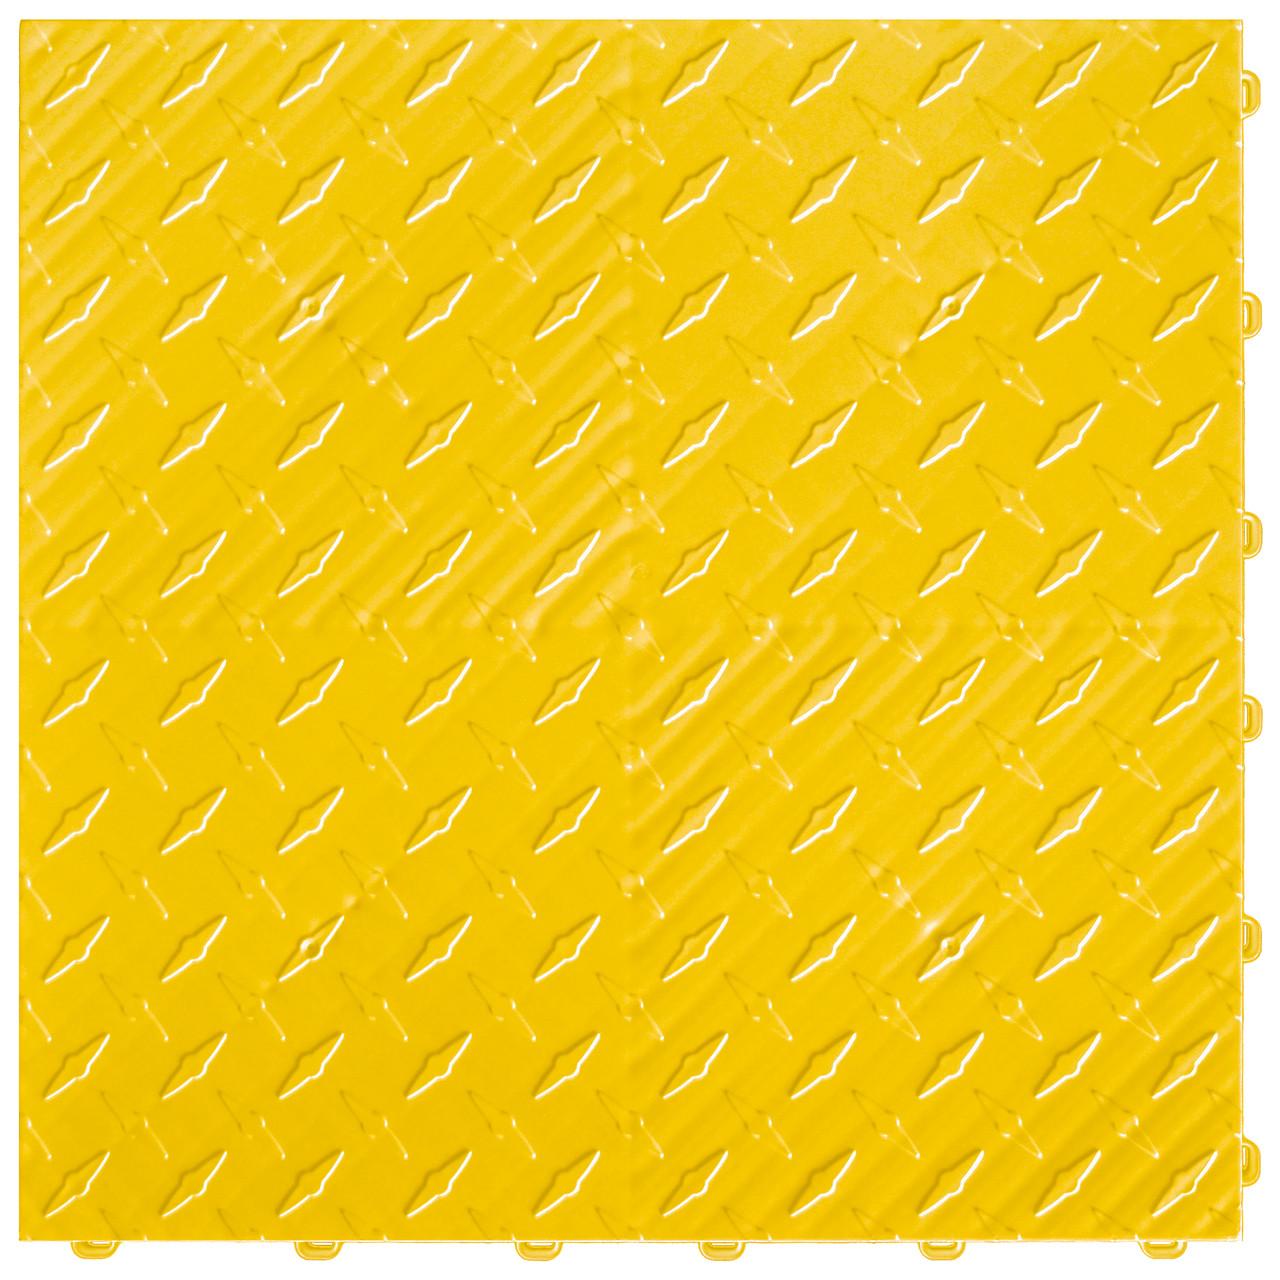 "Citrus Yellow DiamondTrax - SALE PRICE ONLY $3.96 PER SQ FT Tile Size: 15.75"" x 15.75"" x .75 (1 Tile = 1.72 sq ft)"